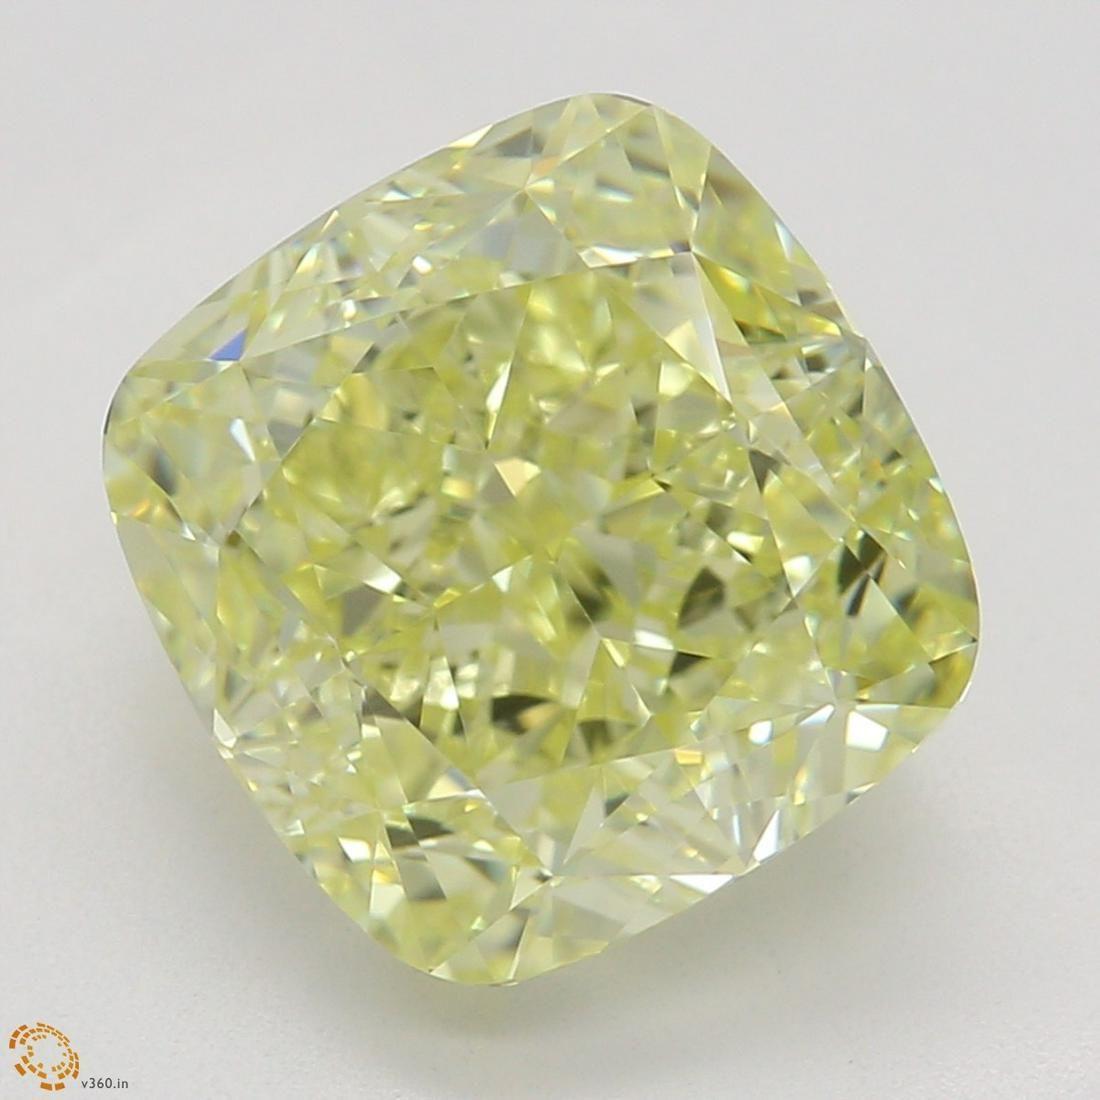 3.12 ct, Yellow/VVS2, Cushion cut GIA Graded Diamond